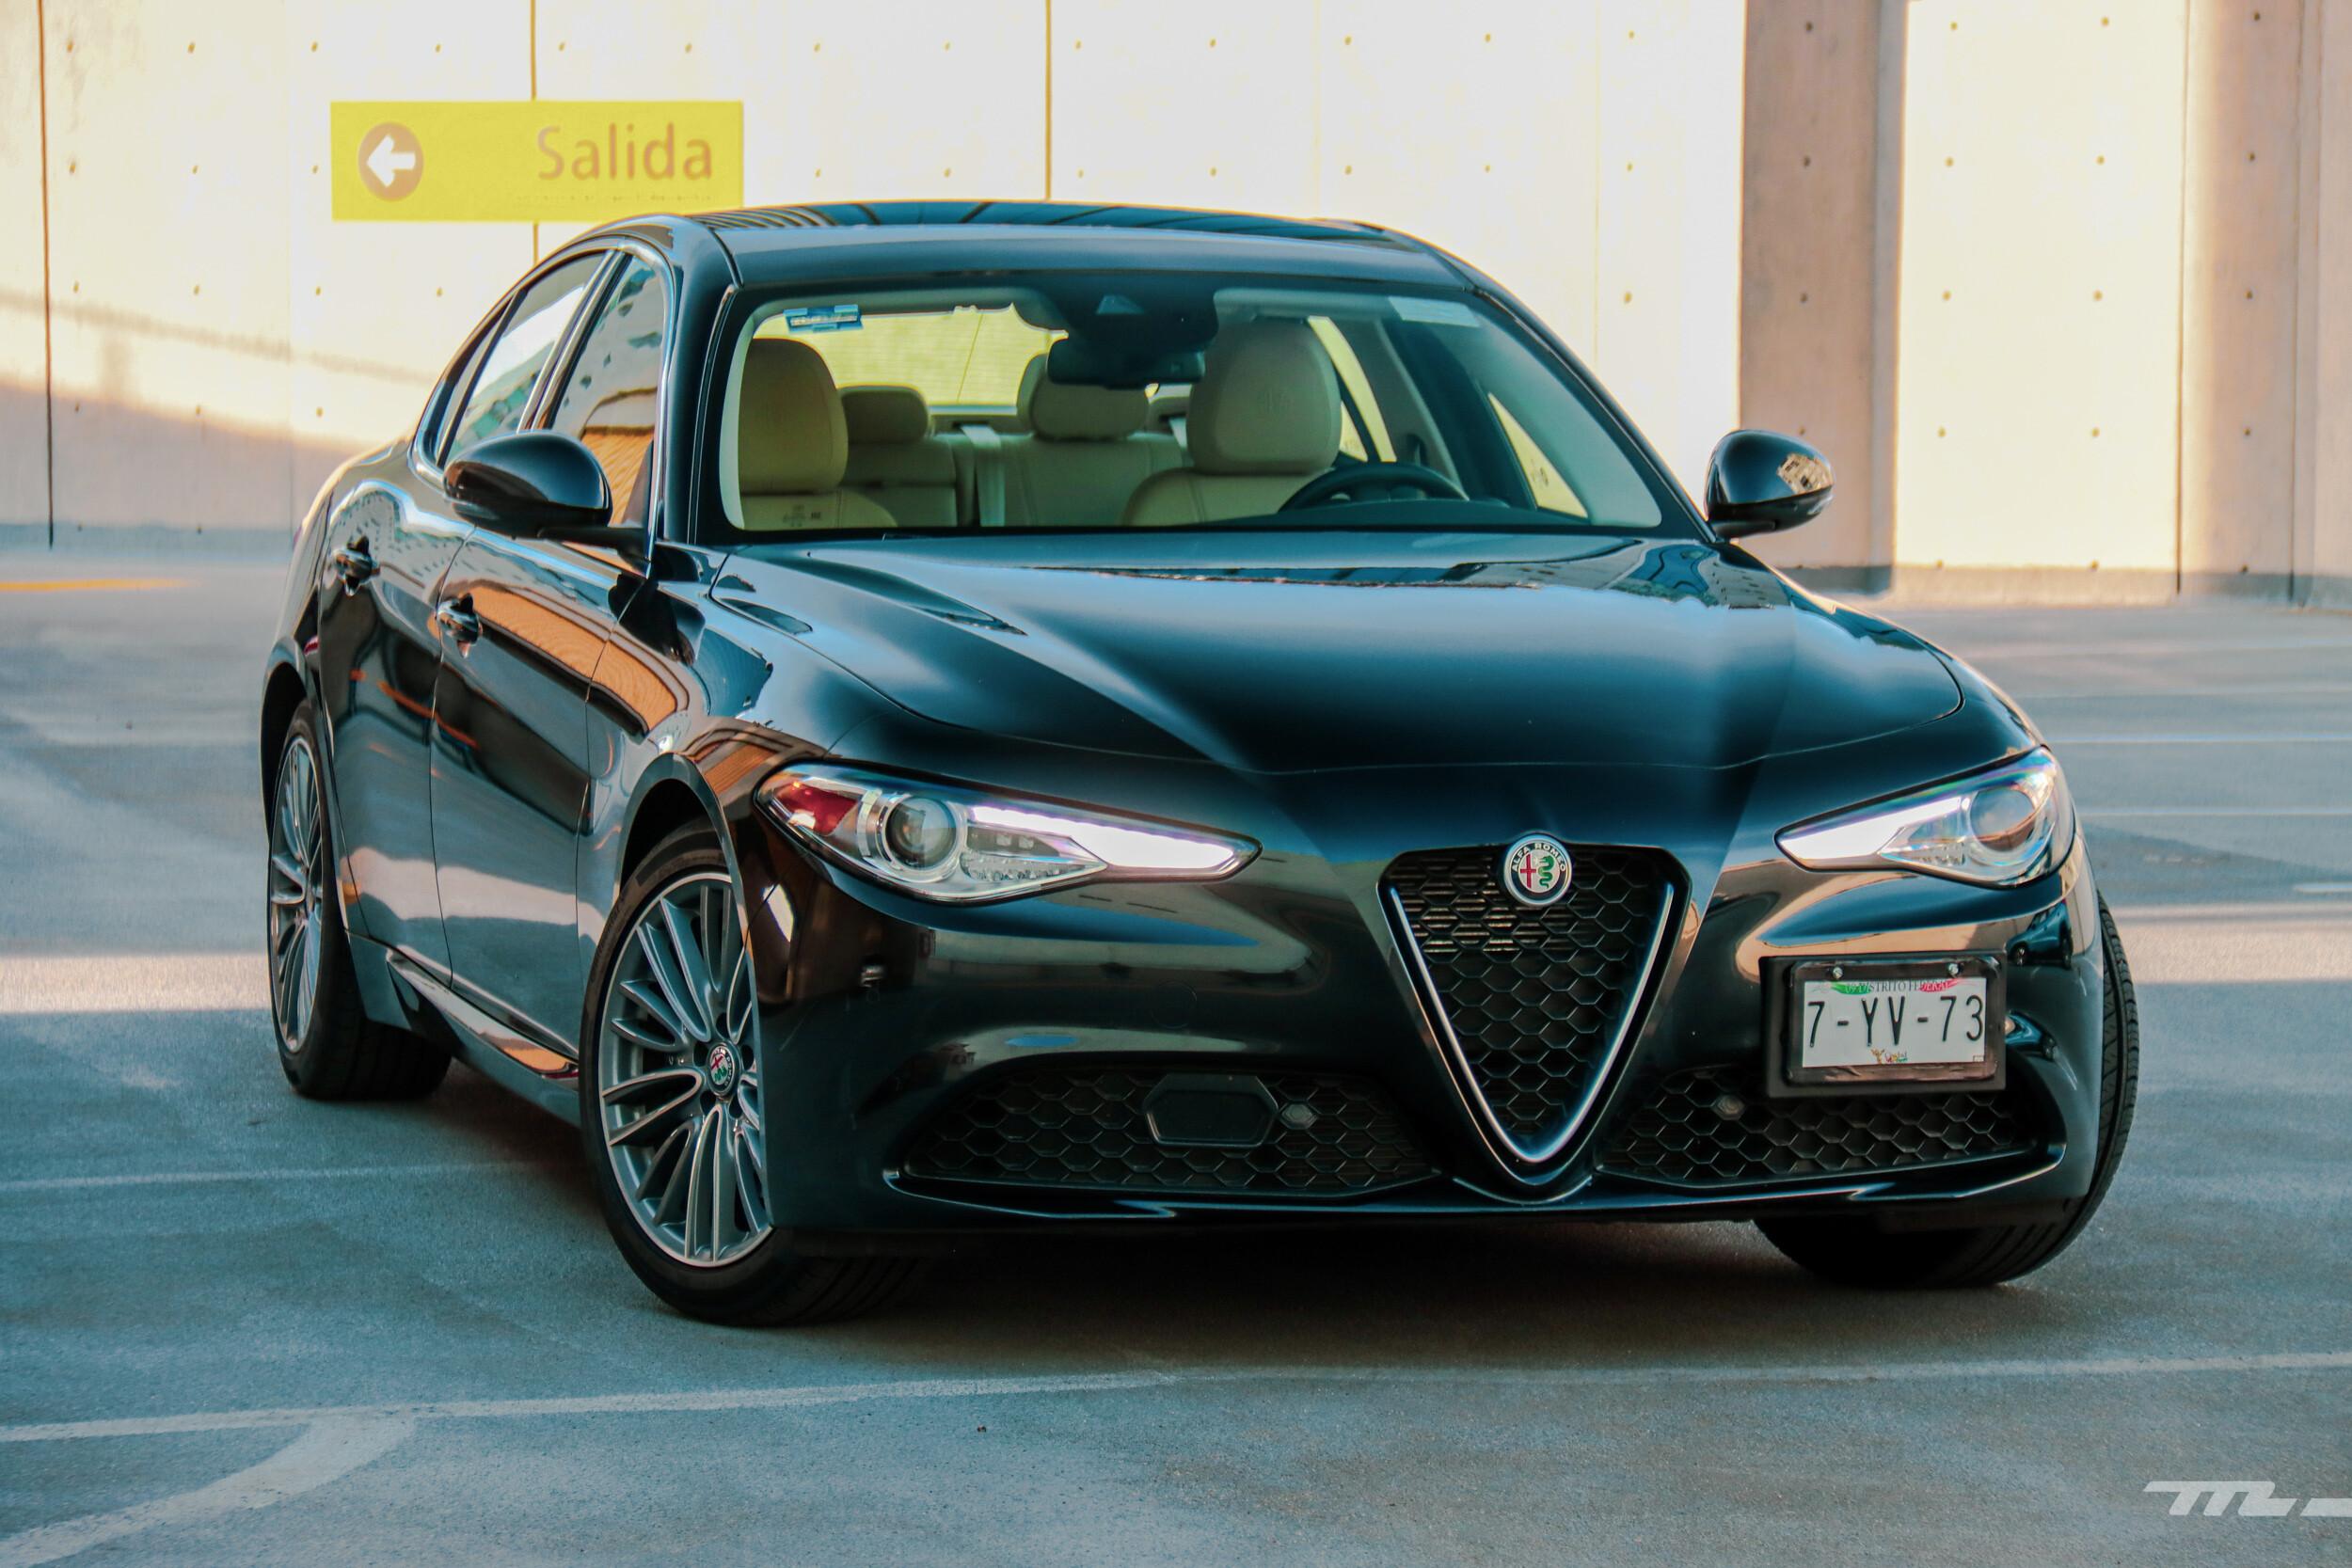 Foto de Alfa Romeo Giulia Lusso 2021 (13/83)